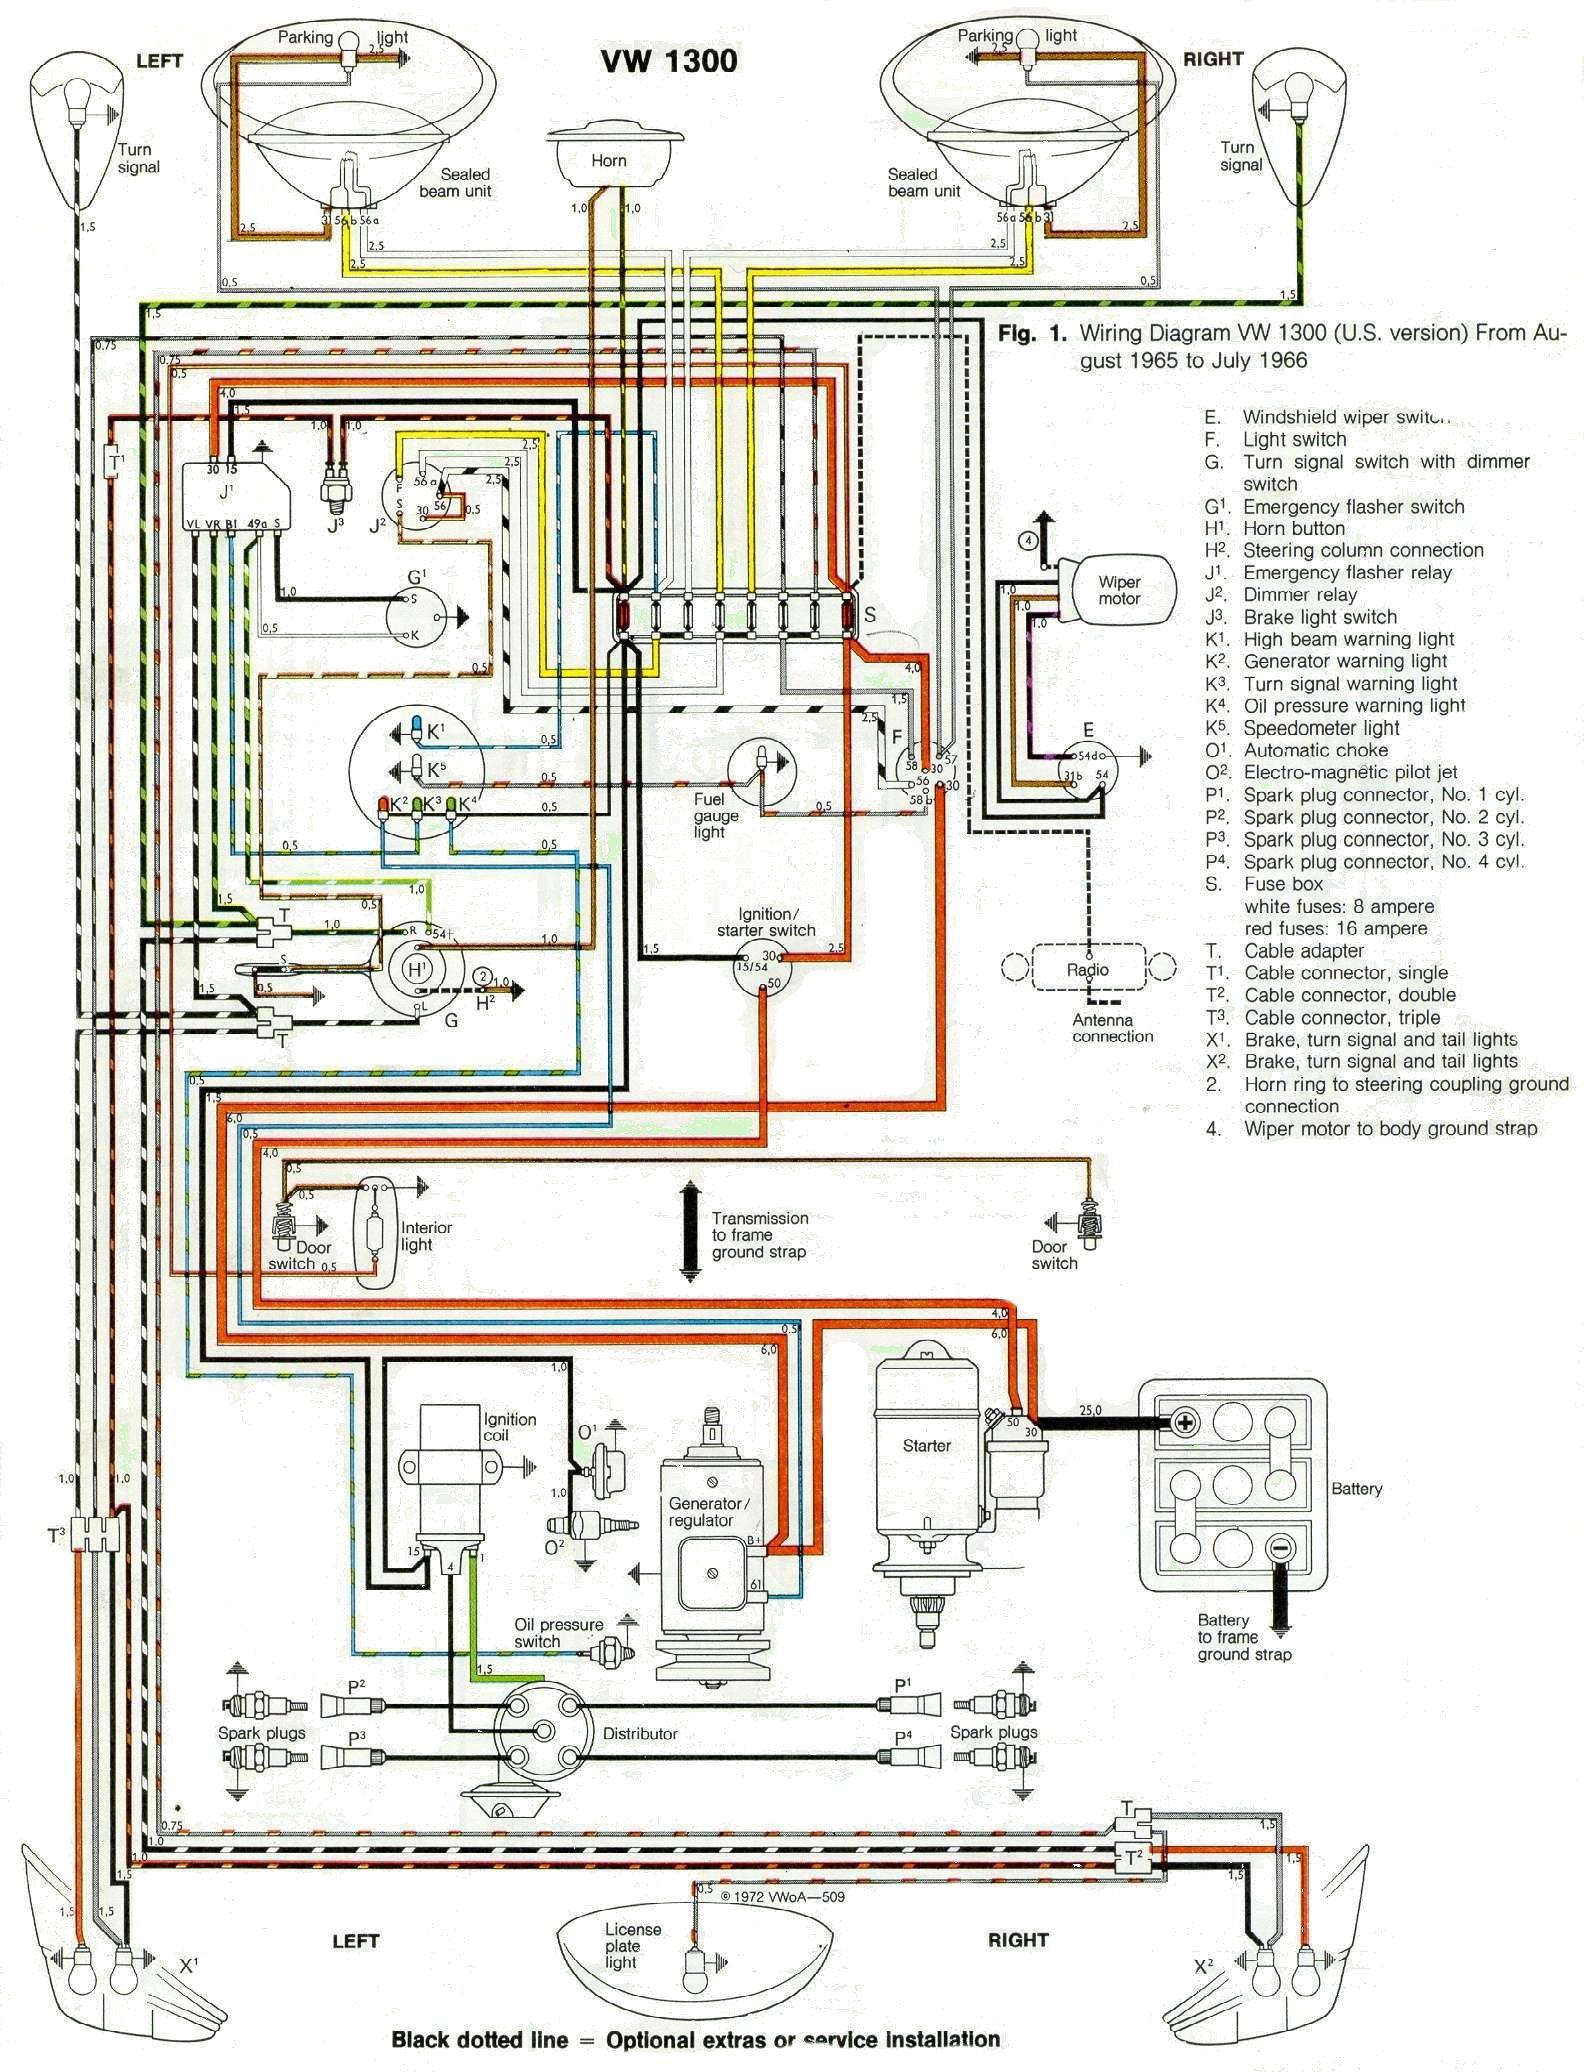 medium resolution of 1966 wiring diagram cox pinterest diagram beetles and vw rh pinterest com vw wiring harness diagram